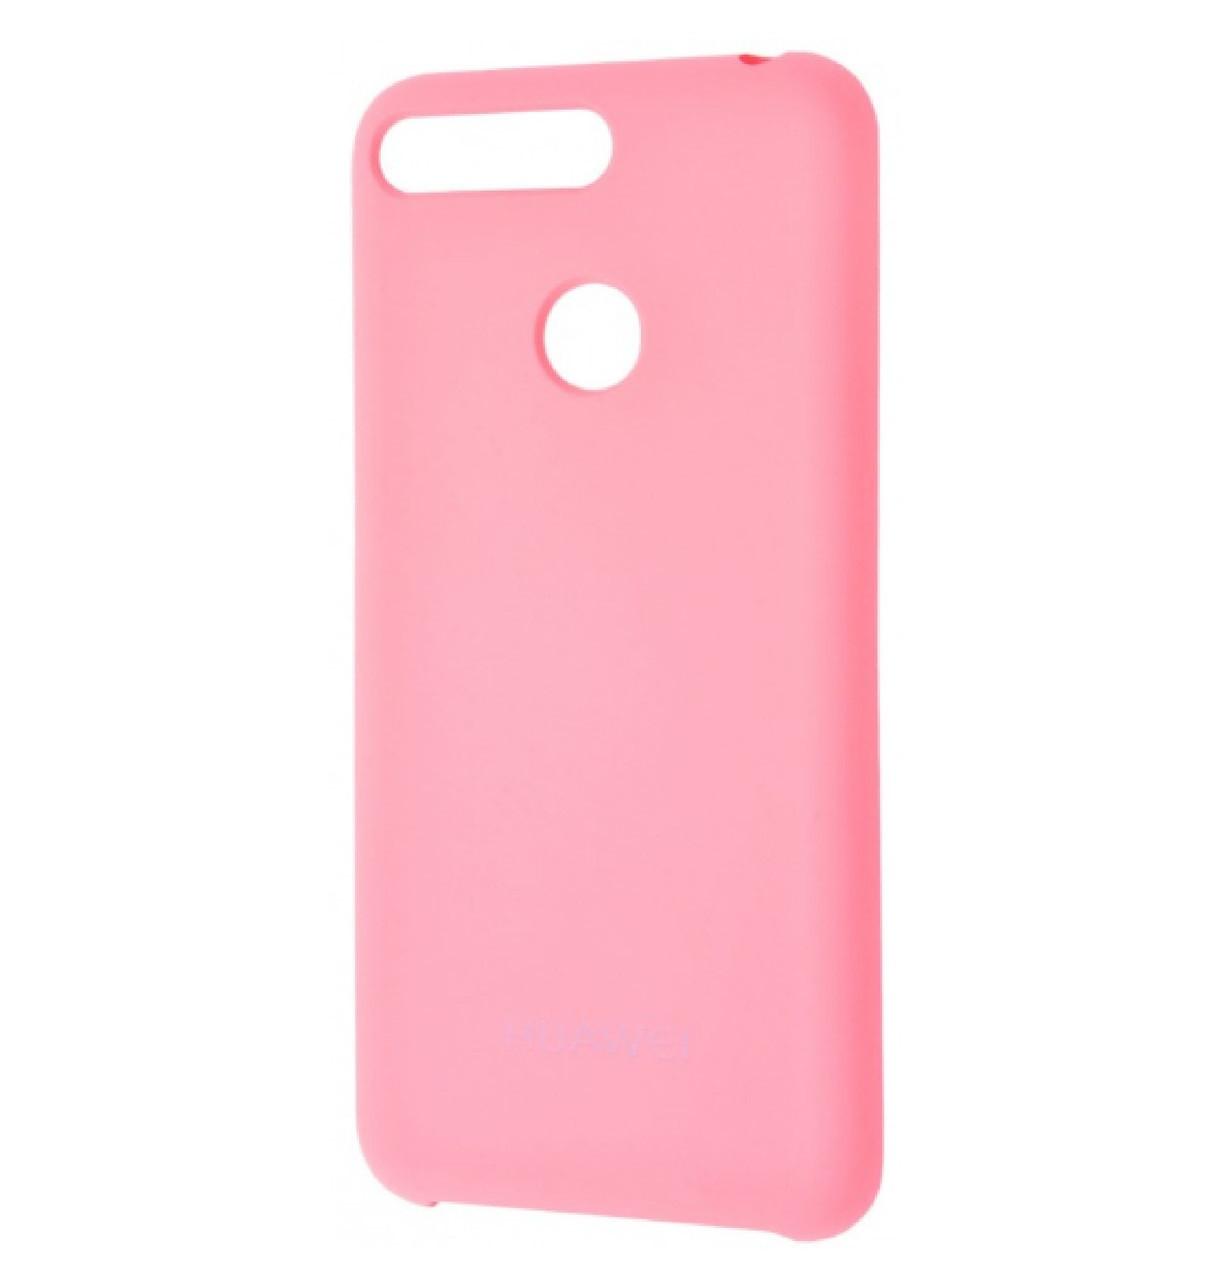 Чехол-накладка Original Silicone case для Huawei Y7 Prime 2018 / 7C Pro / Enjoy 8 Pink